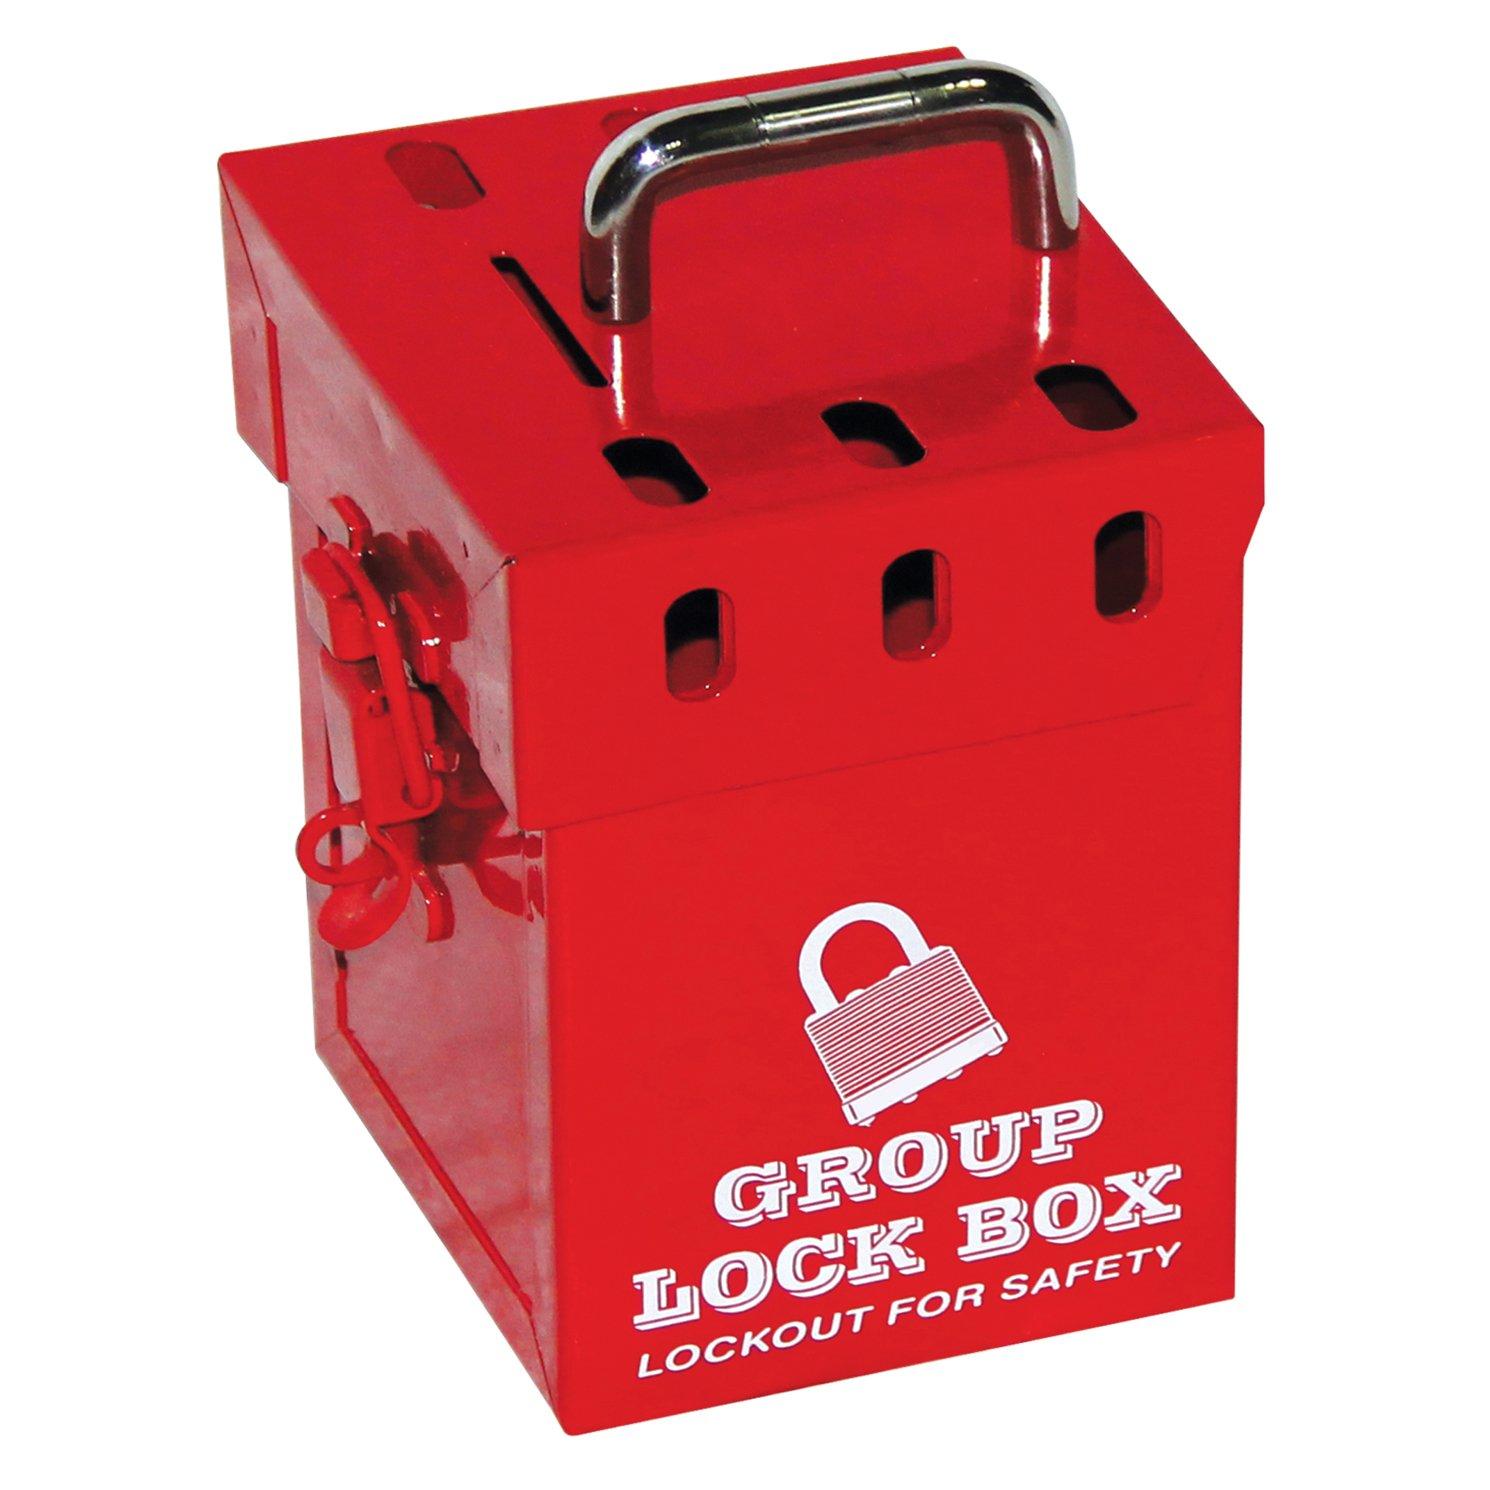 Lockout Safety Supply 7286 Mini Group Lock Box, Holds 7 Padlocks, Red